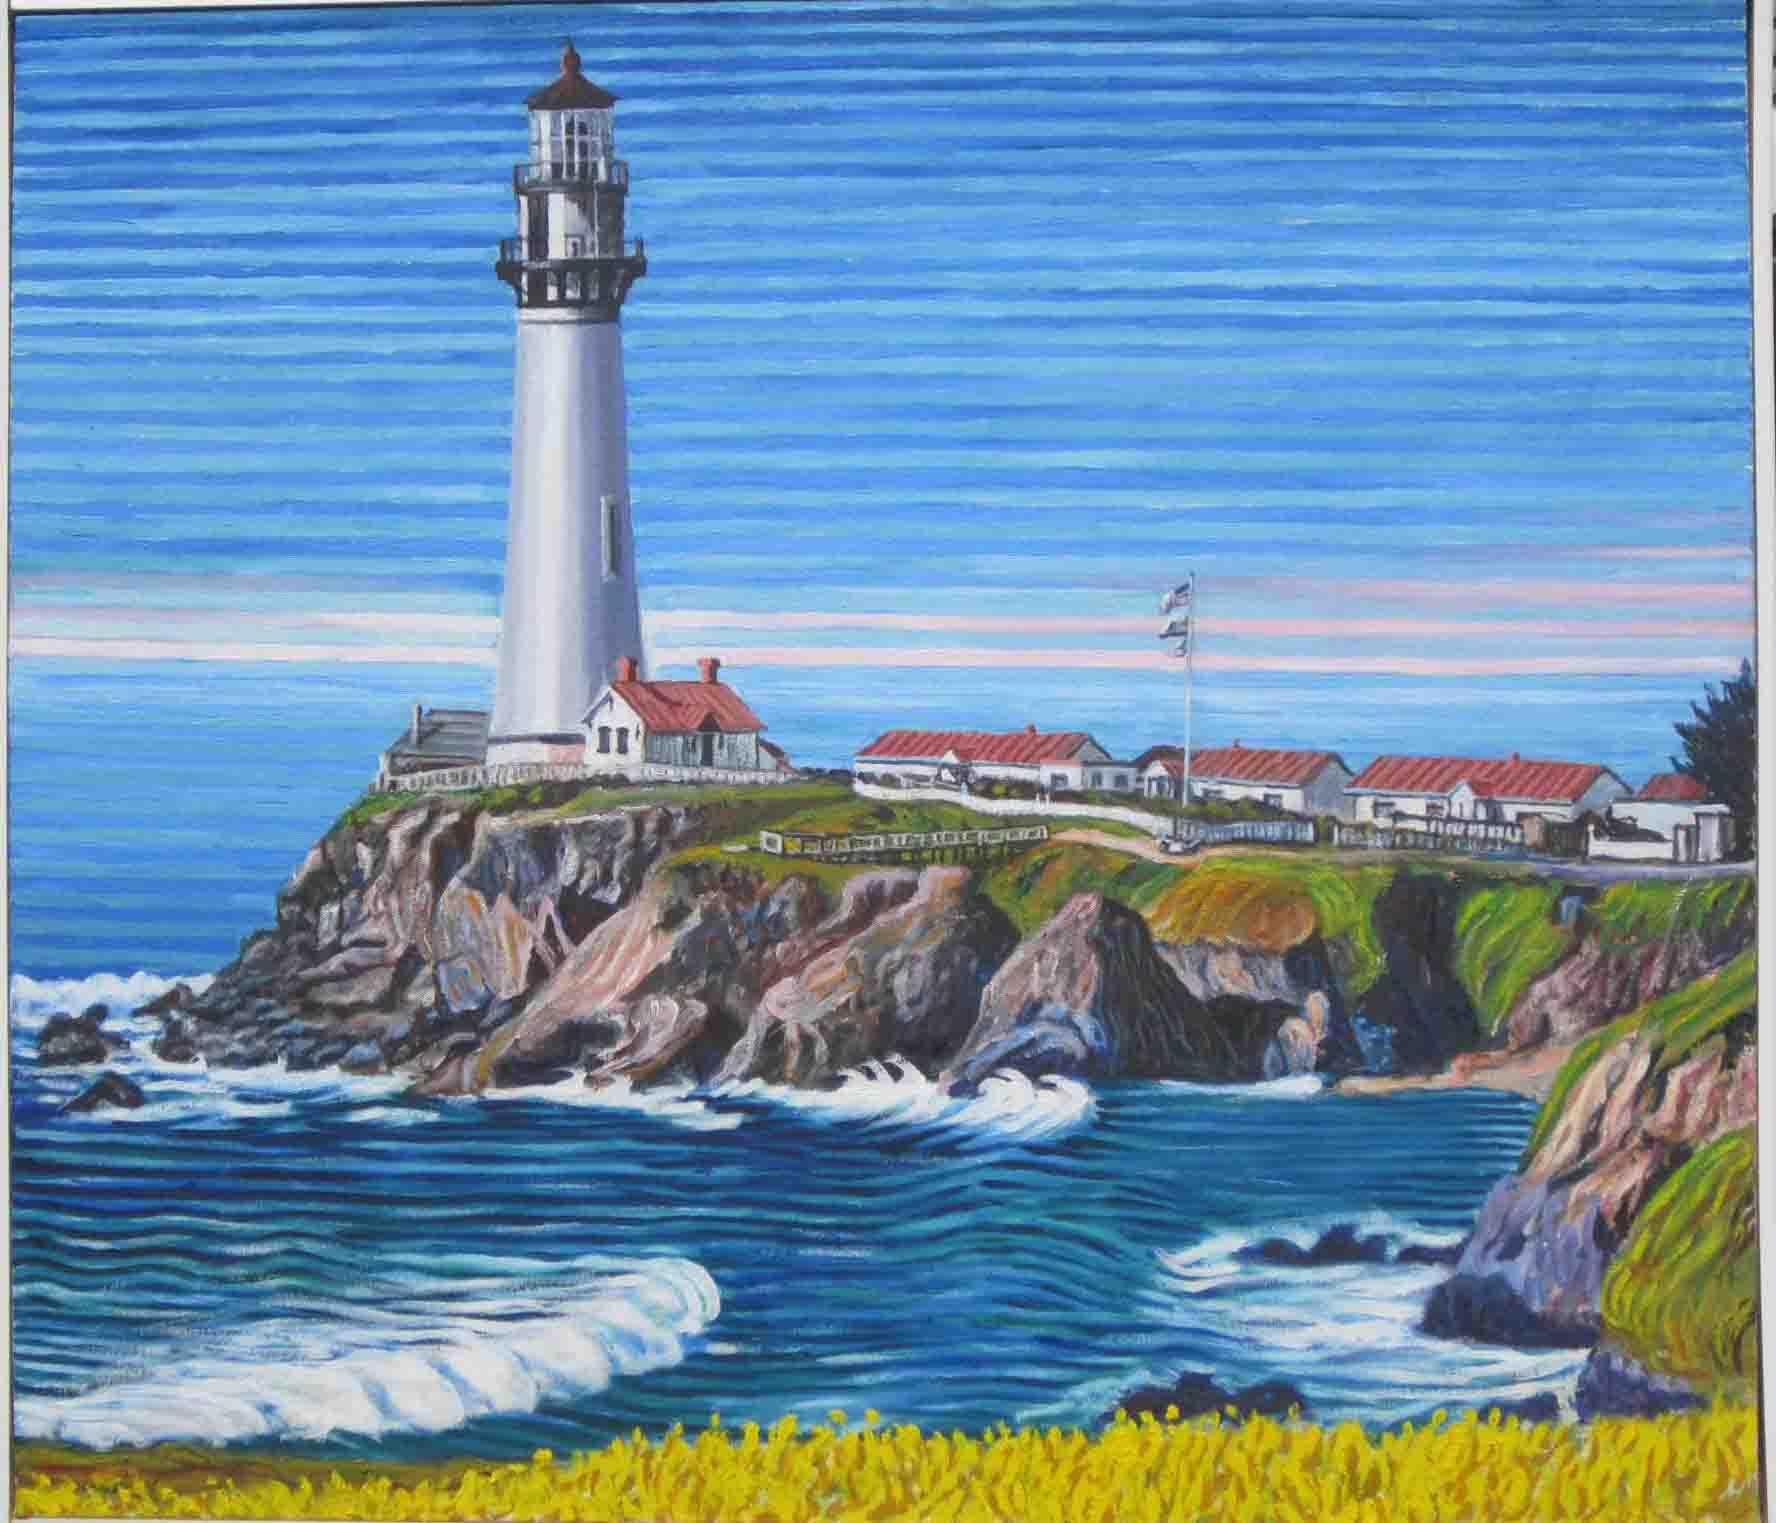 Pigeon point lighthouse - Linear Painting - Prakash N Chandras